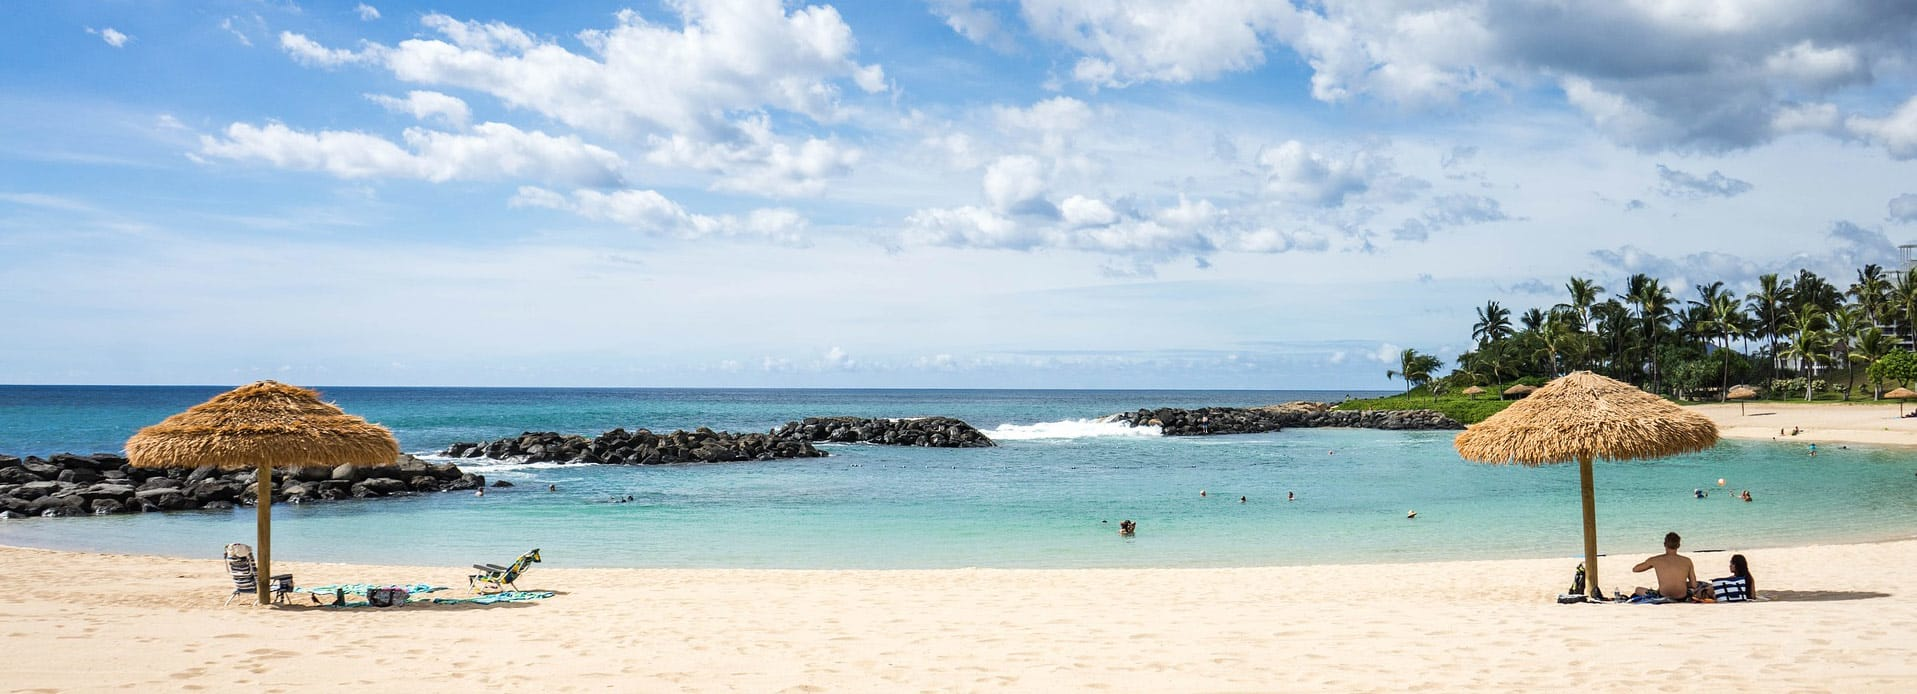 Hawaii cruises beach relaxation